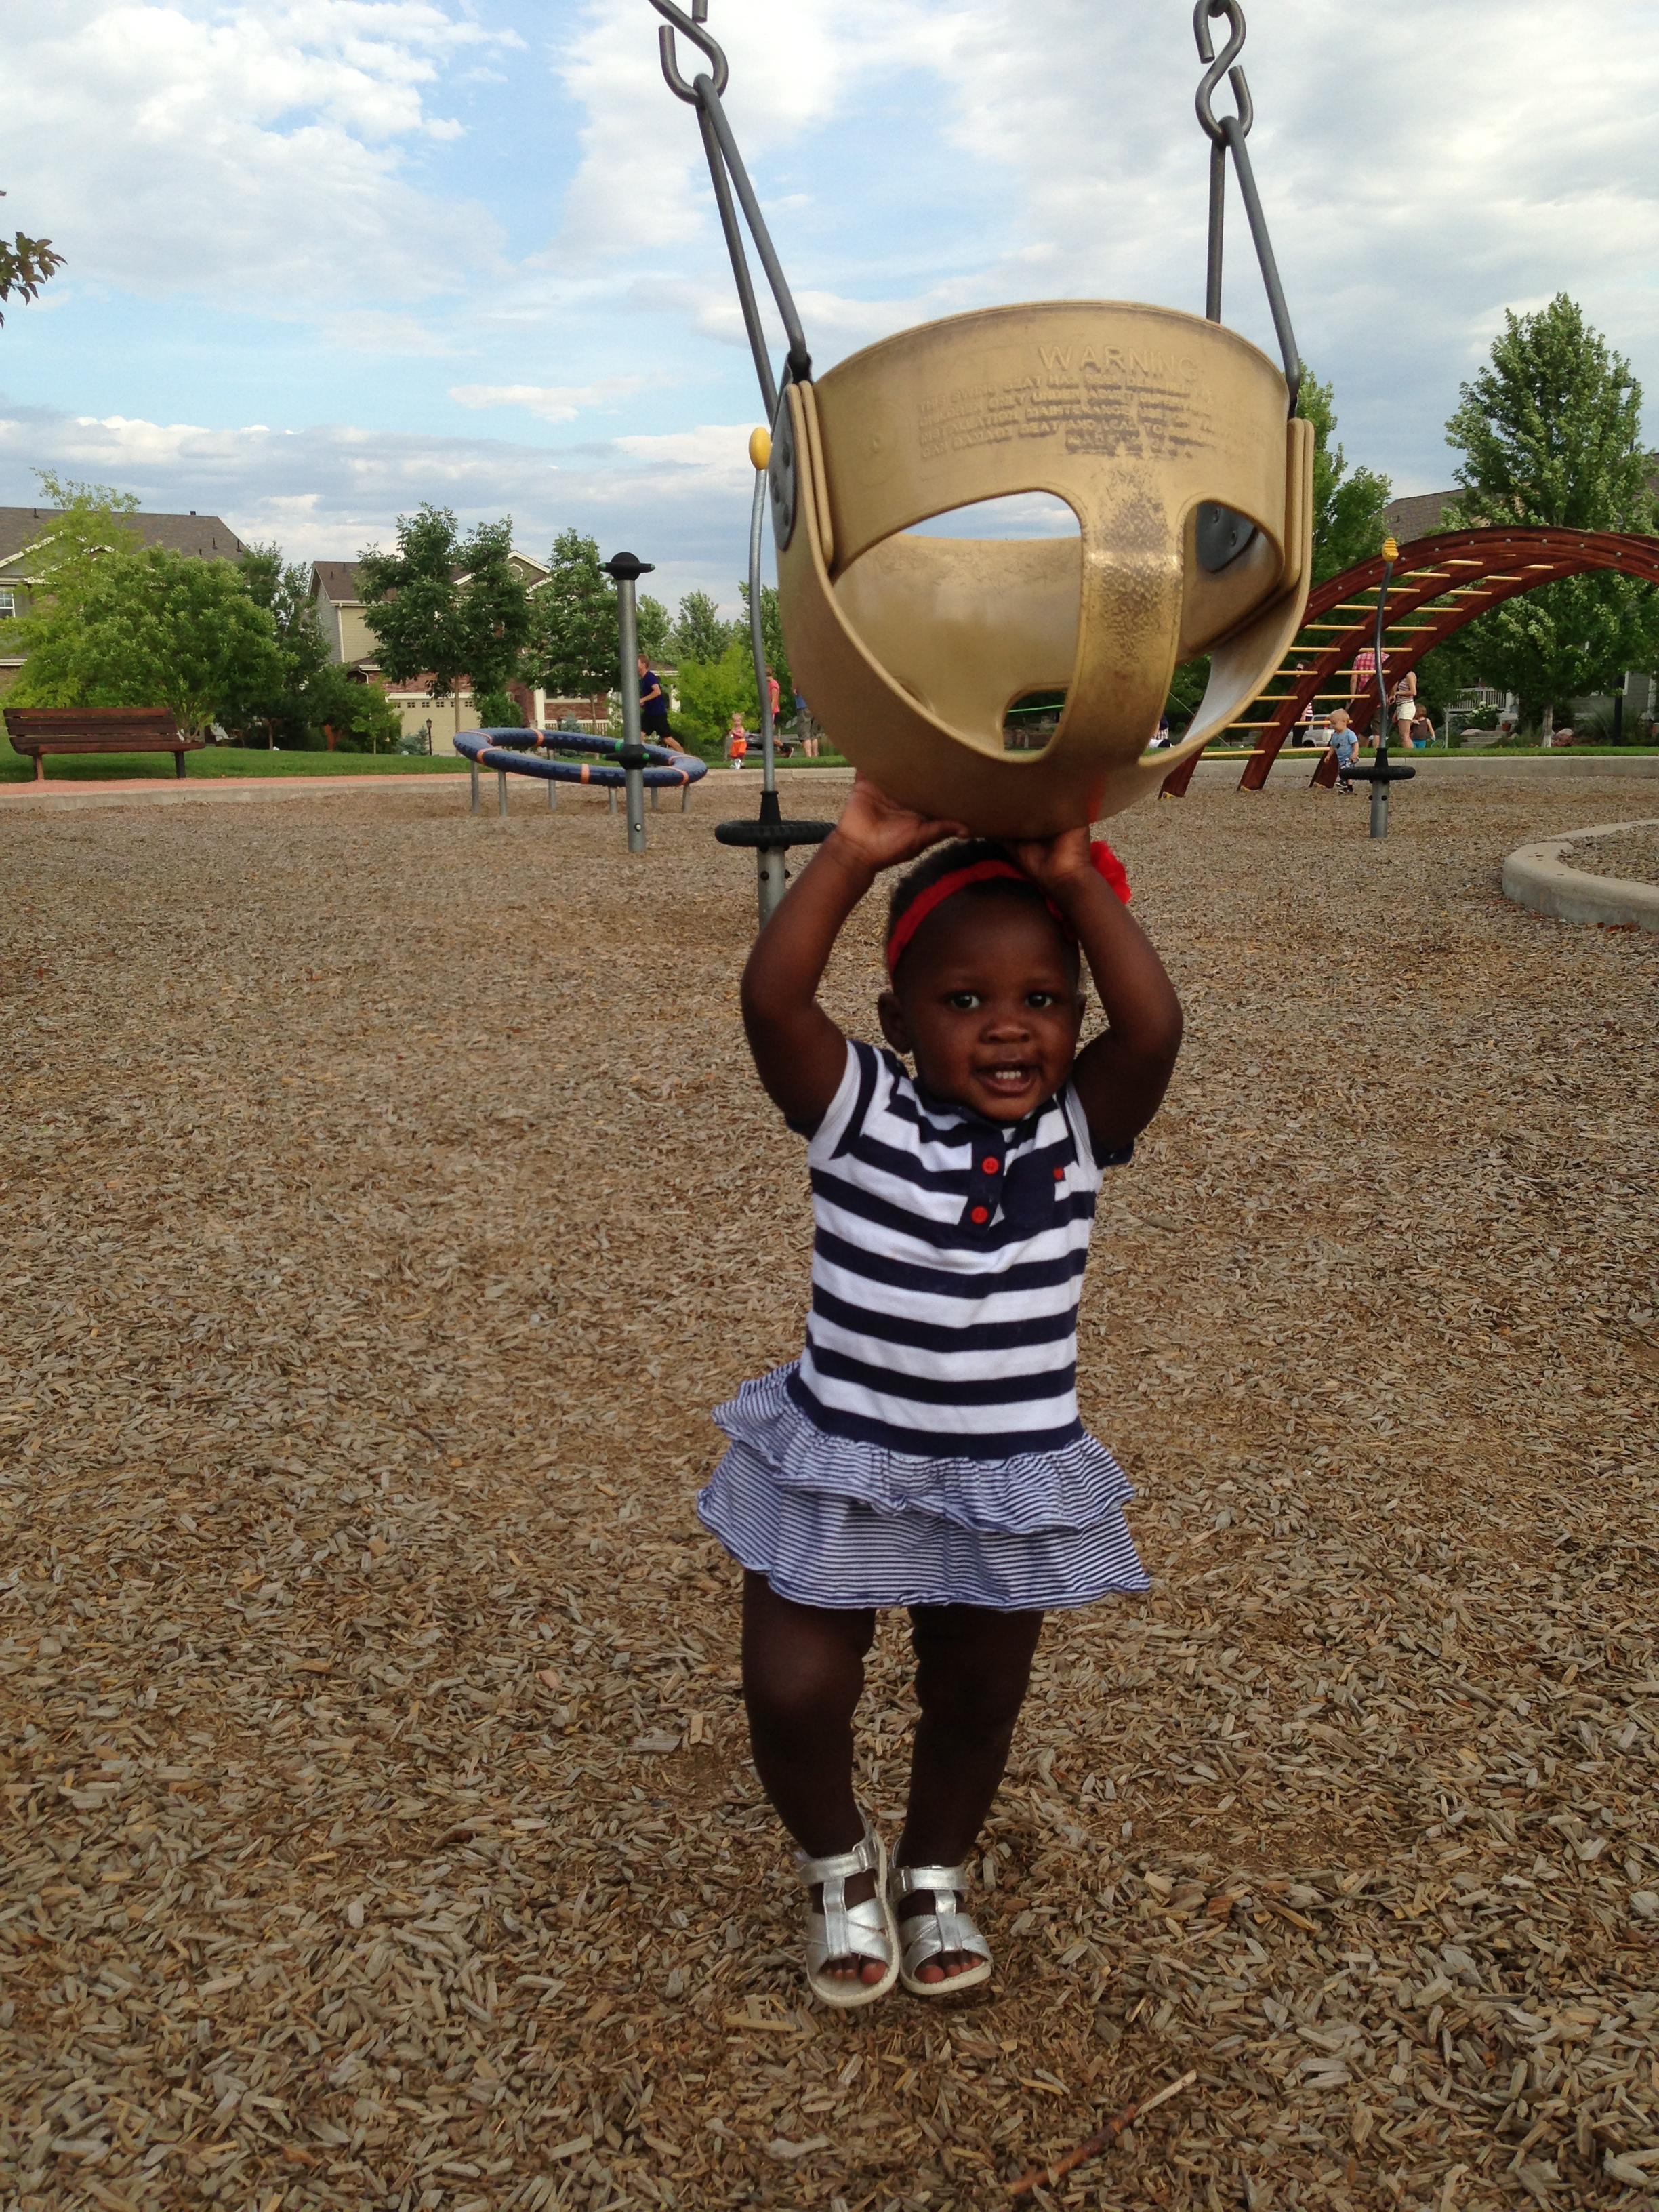 Girl - Summer - Playground